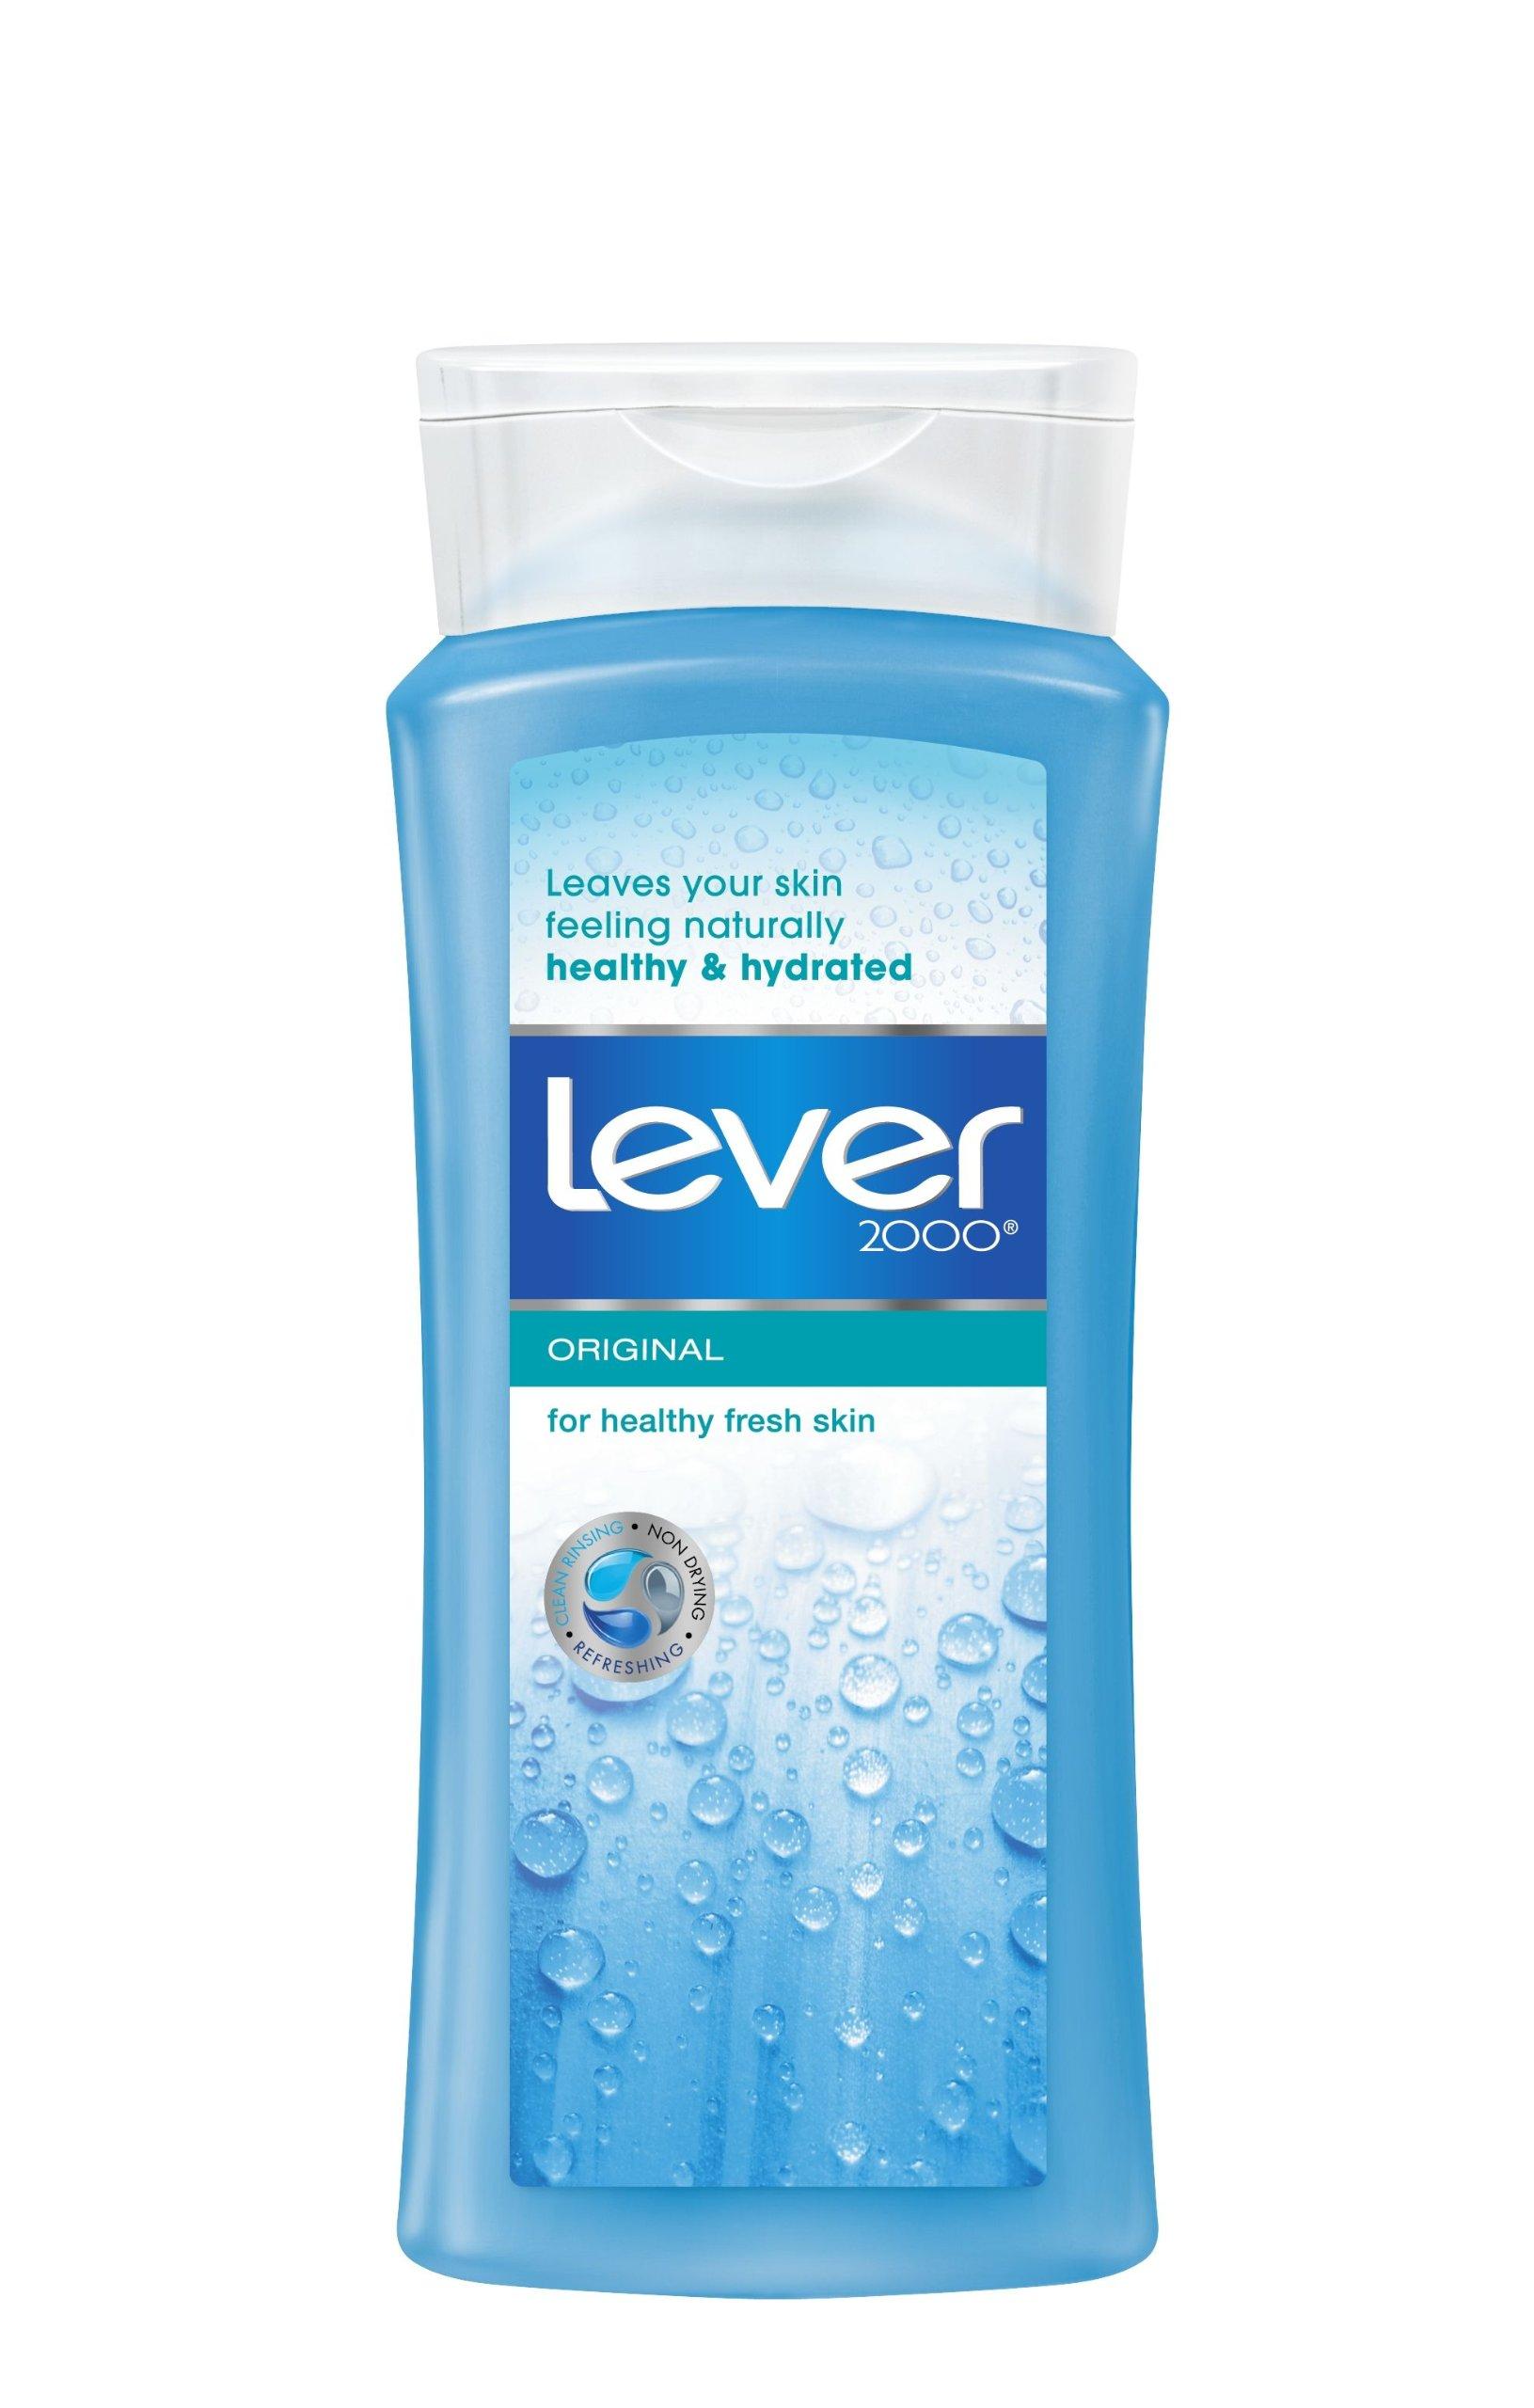 Lever 2000 Body Wash Original, 16.9 Ounce